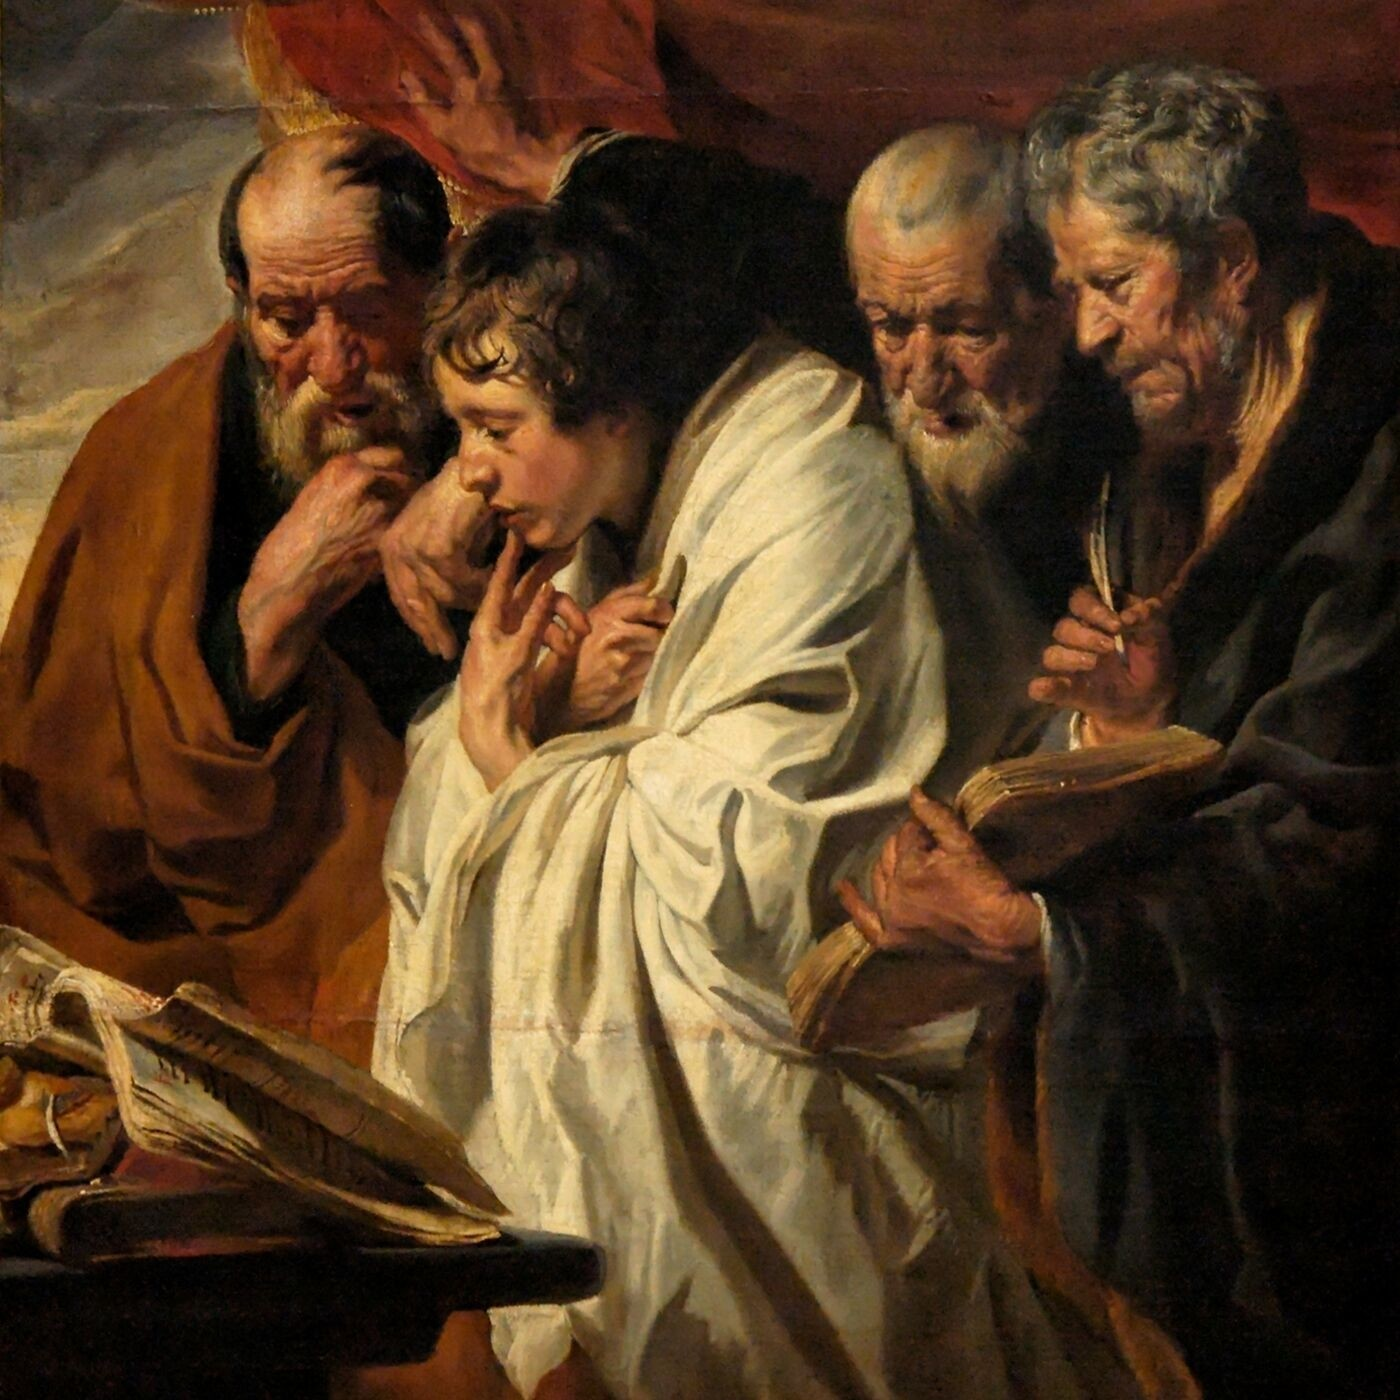 Jesus Prays for Himself